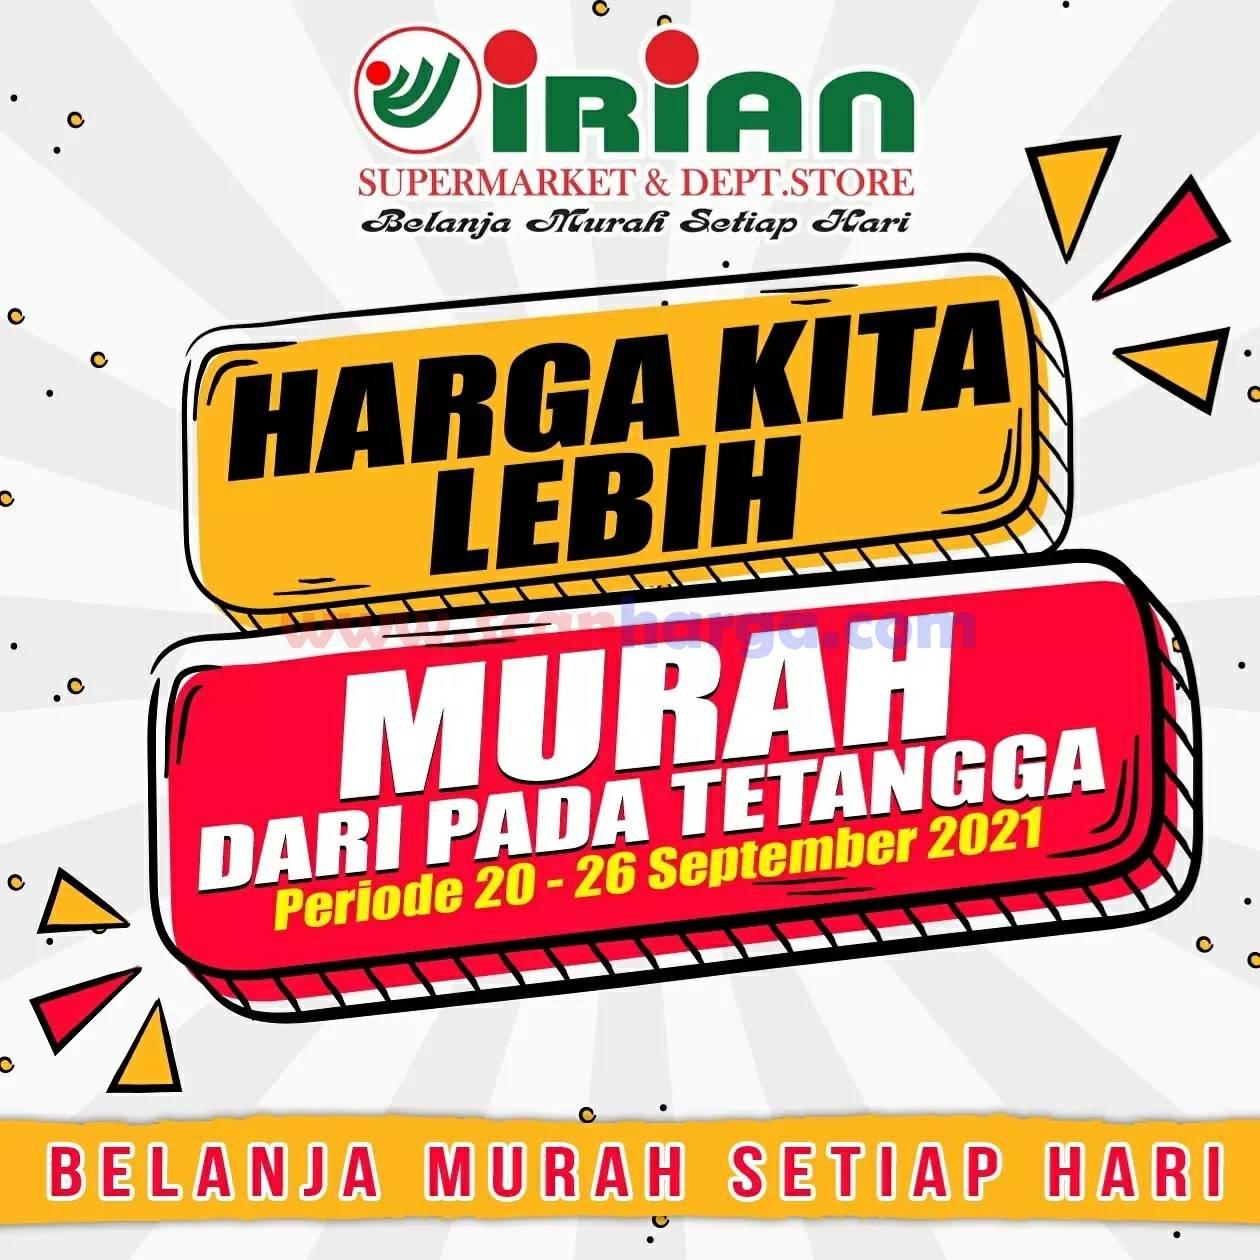 Katalog Promo IRIAN Supermarket 20 - 26 September 2021